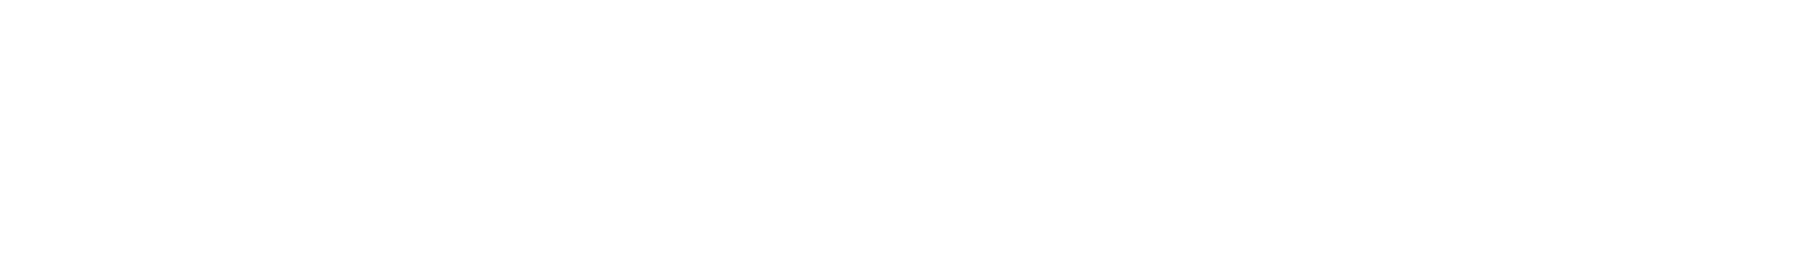 ne loopkit 125 03 b